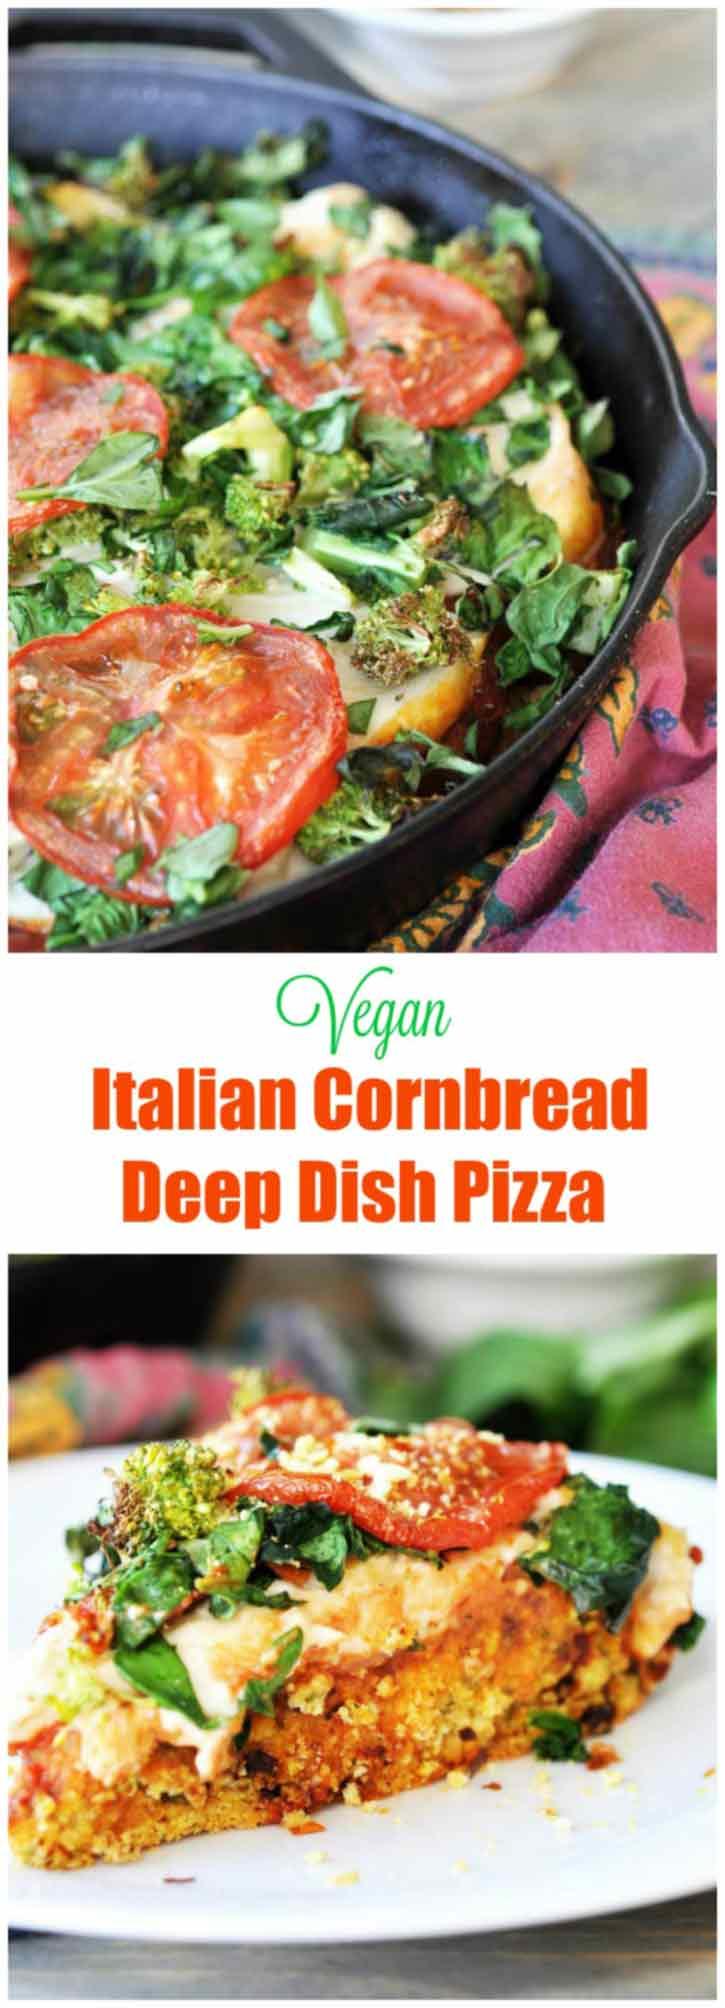 Vegan Deep Dish Pizza with Italian Cornbread Crust! This thick, gooey, delicious deep dish pizza recipe is a crowd pleaser. www.veganosity.com